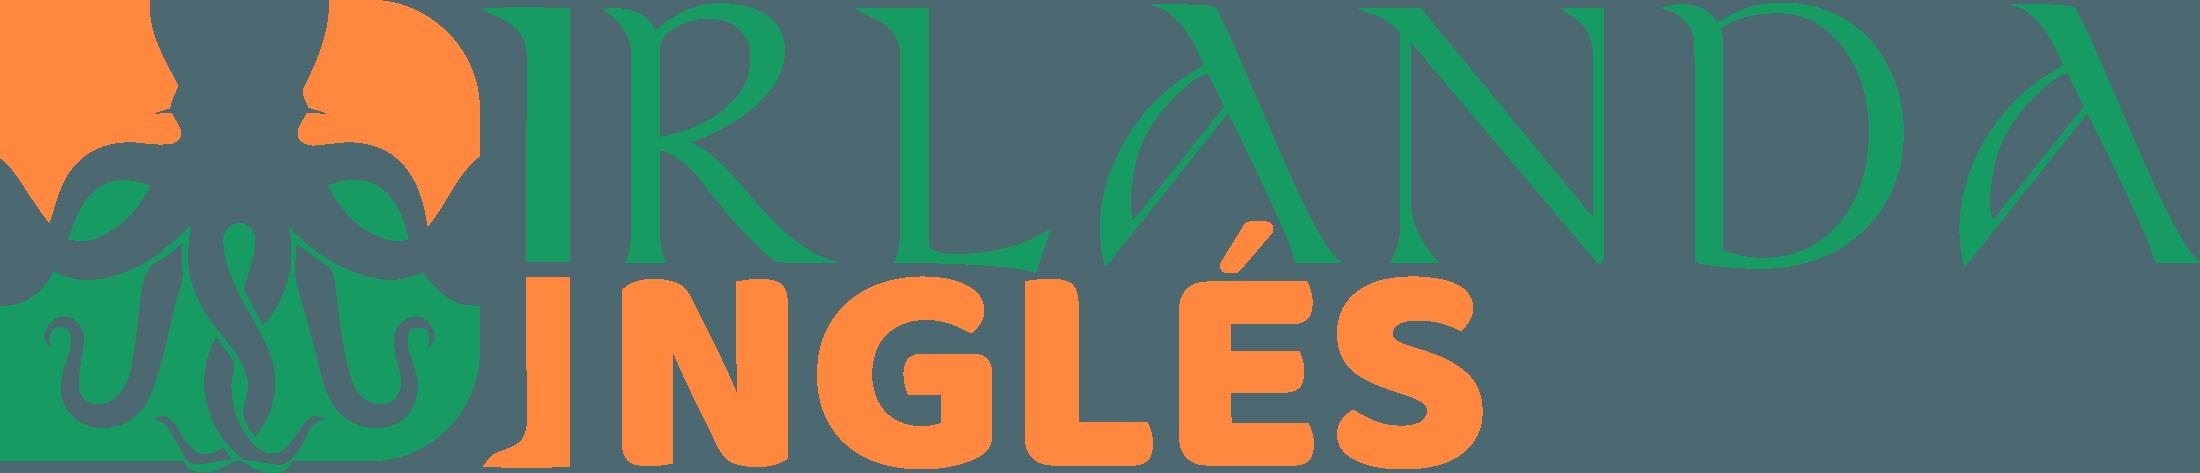 Irlanda-ingles-logo-cursos-en-Limerick